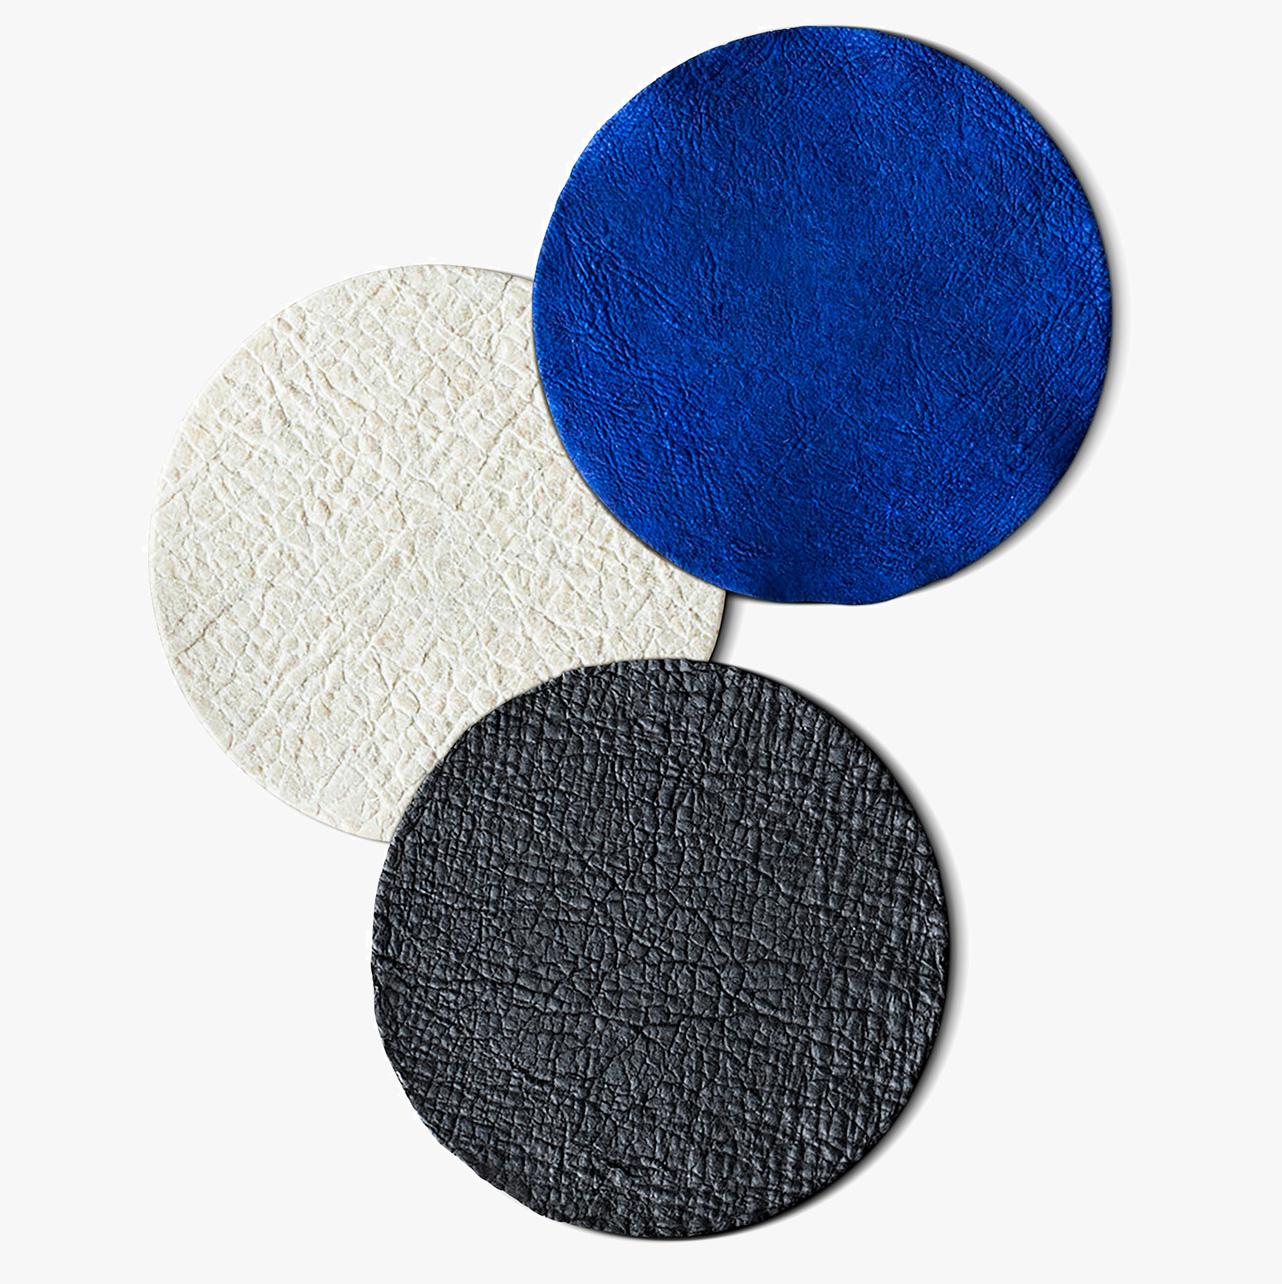 Eco-Friendly Vegan Leather Alternatives - Zoa Biofabricated Vegan Leather